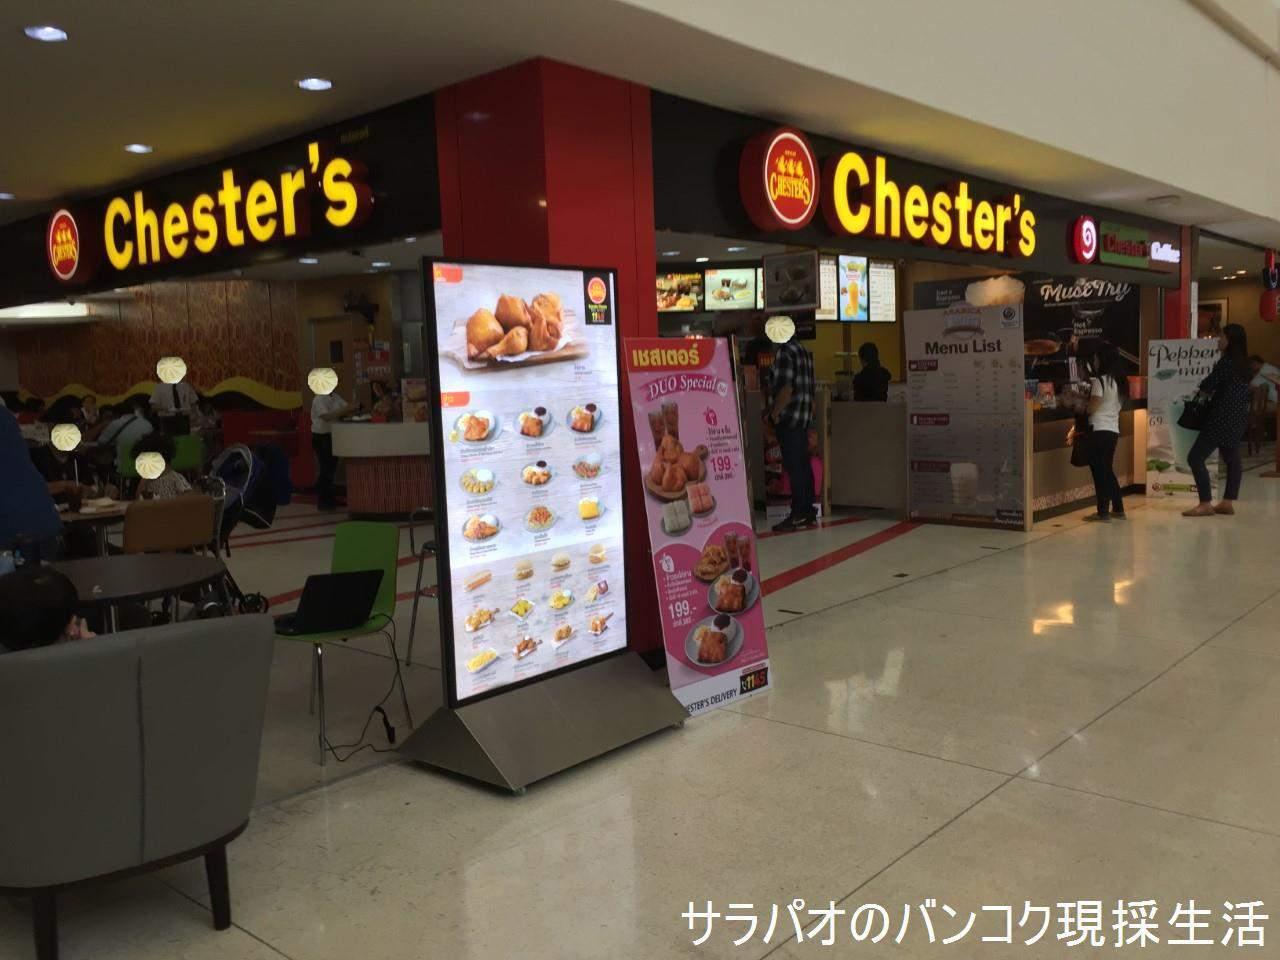 ChestersImmigration_01.jpg